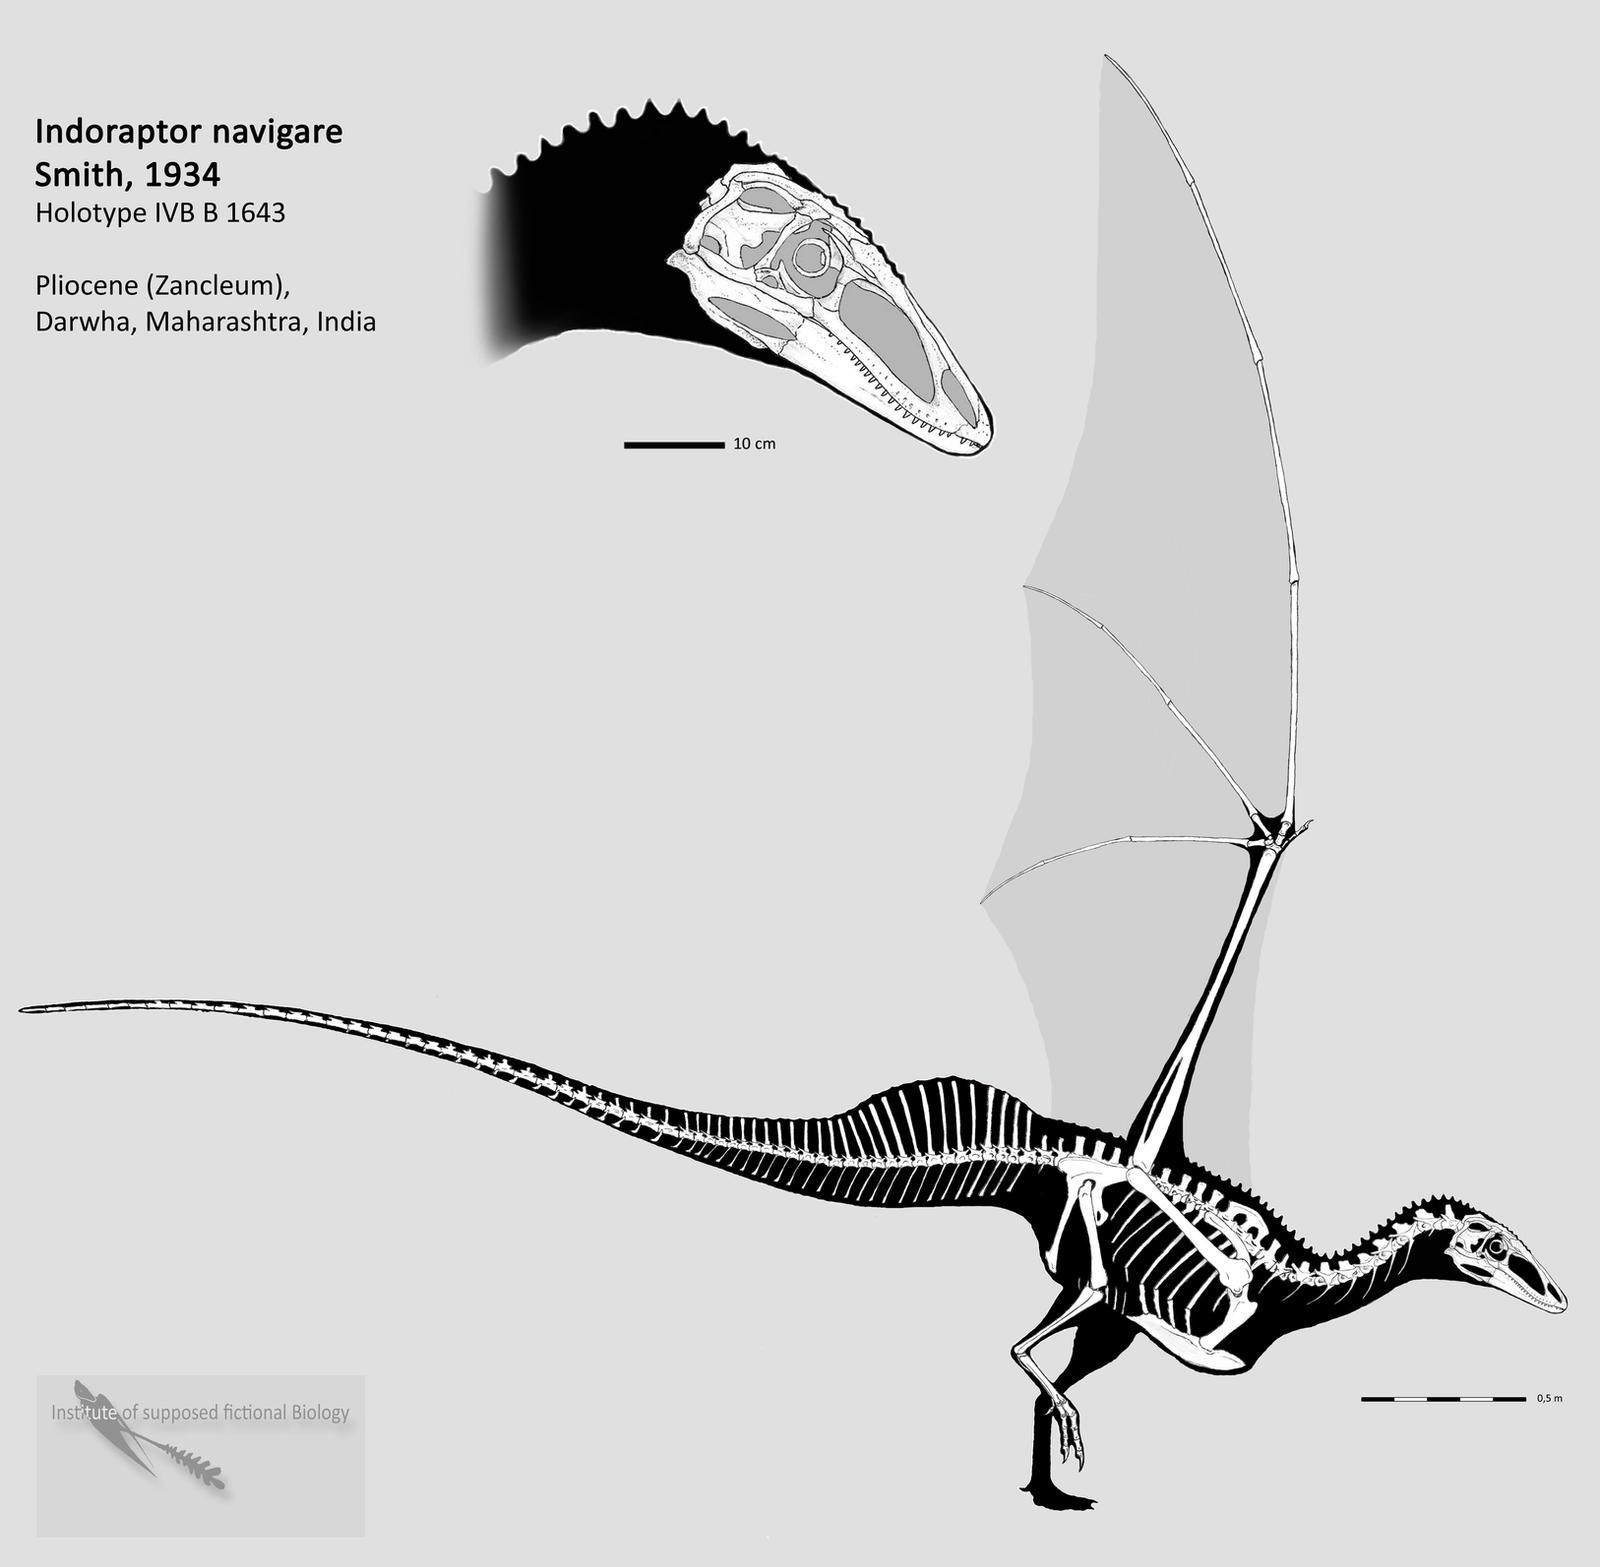 Indoraptor complete skeleton by Hyrotrioskjan